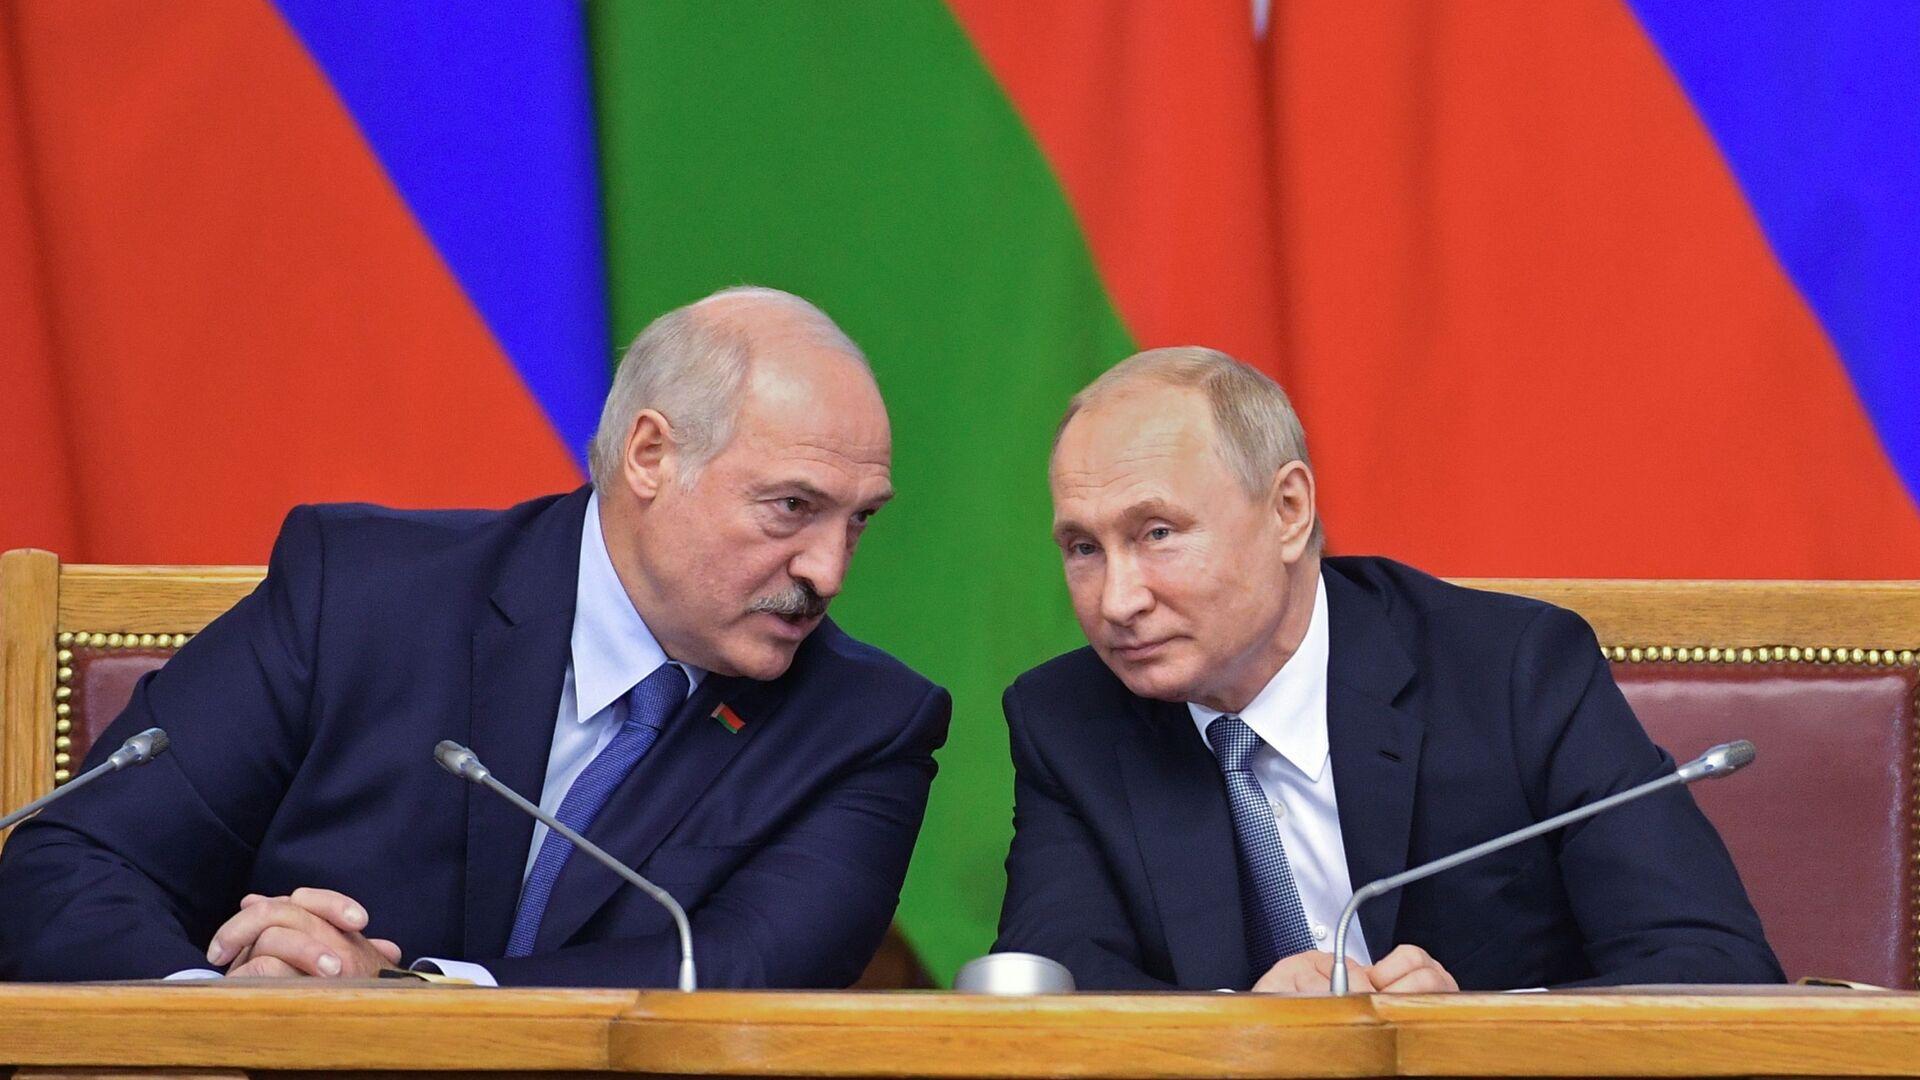 Президент РФ Владимир Путин и президент Белоруссии Александр Лукашенко - Sputnik Таджикистан, 1920, 09.09.2021